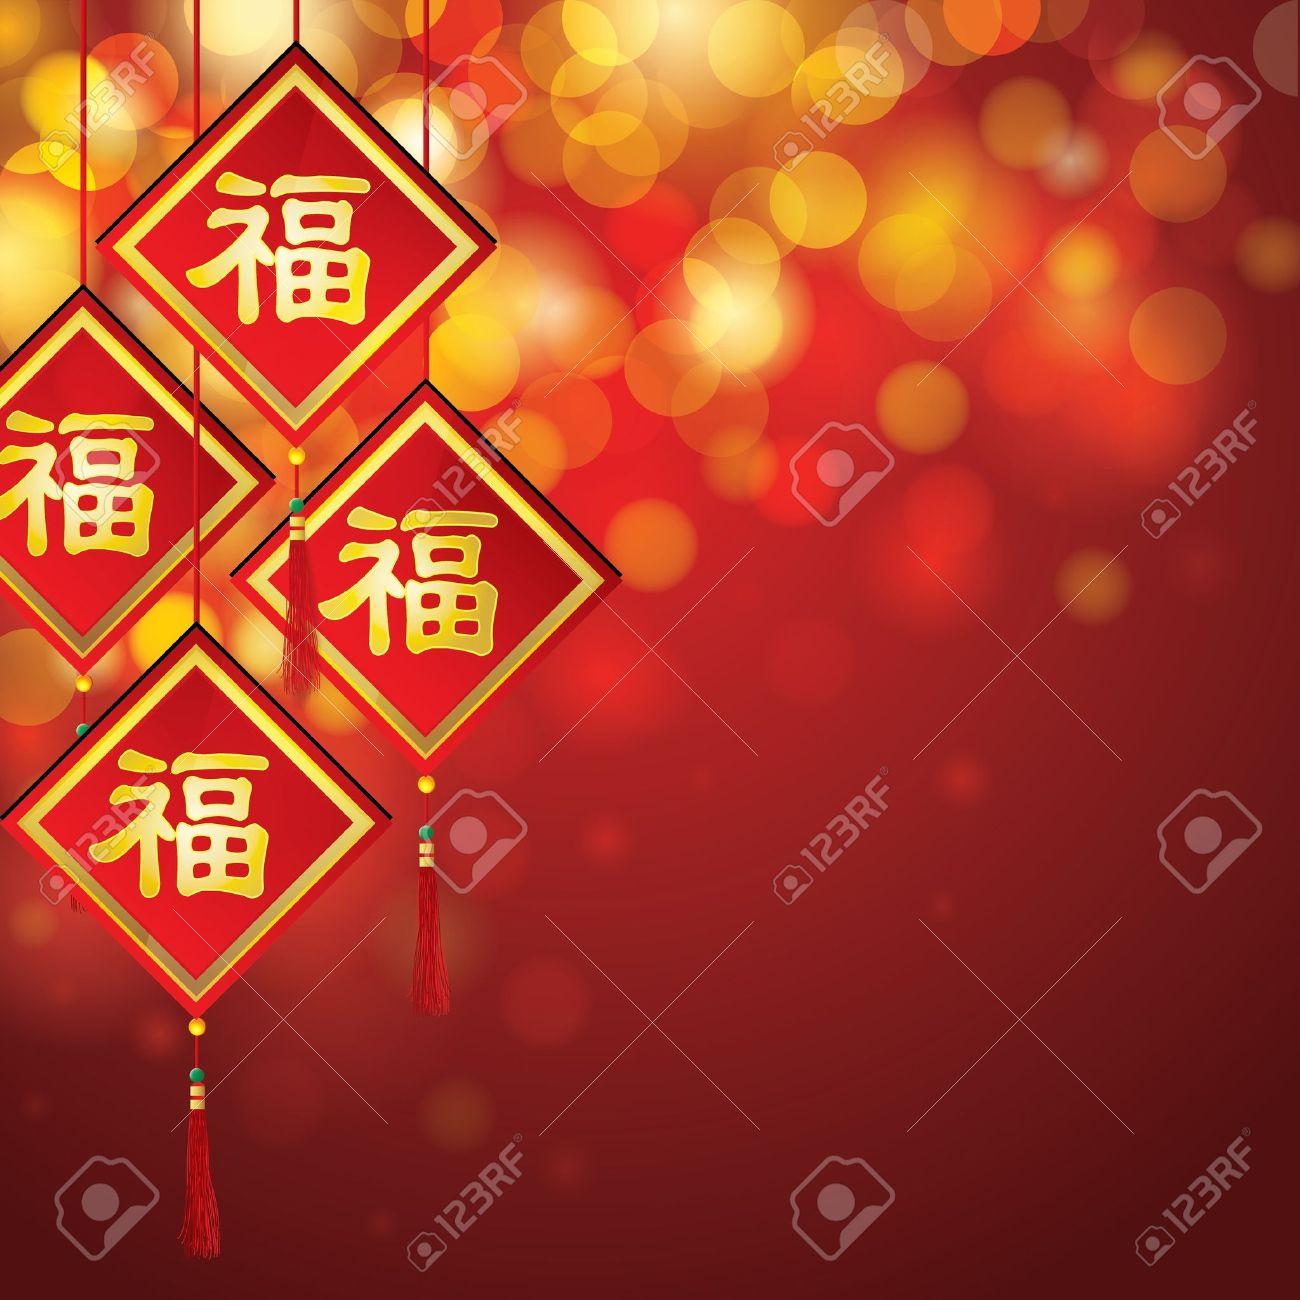 Chinese Symbol Wallpaper